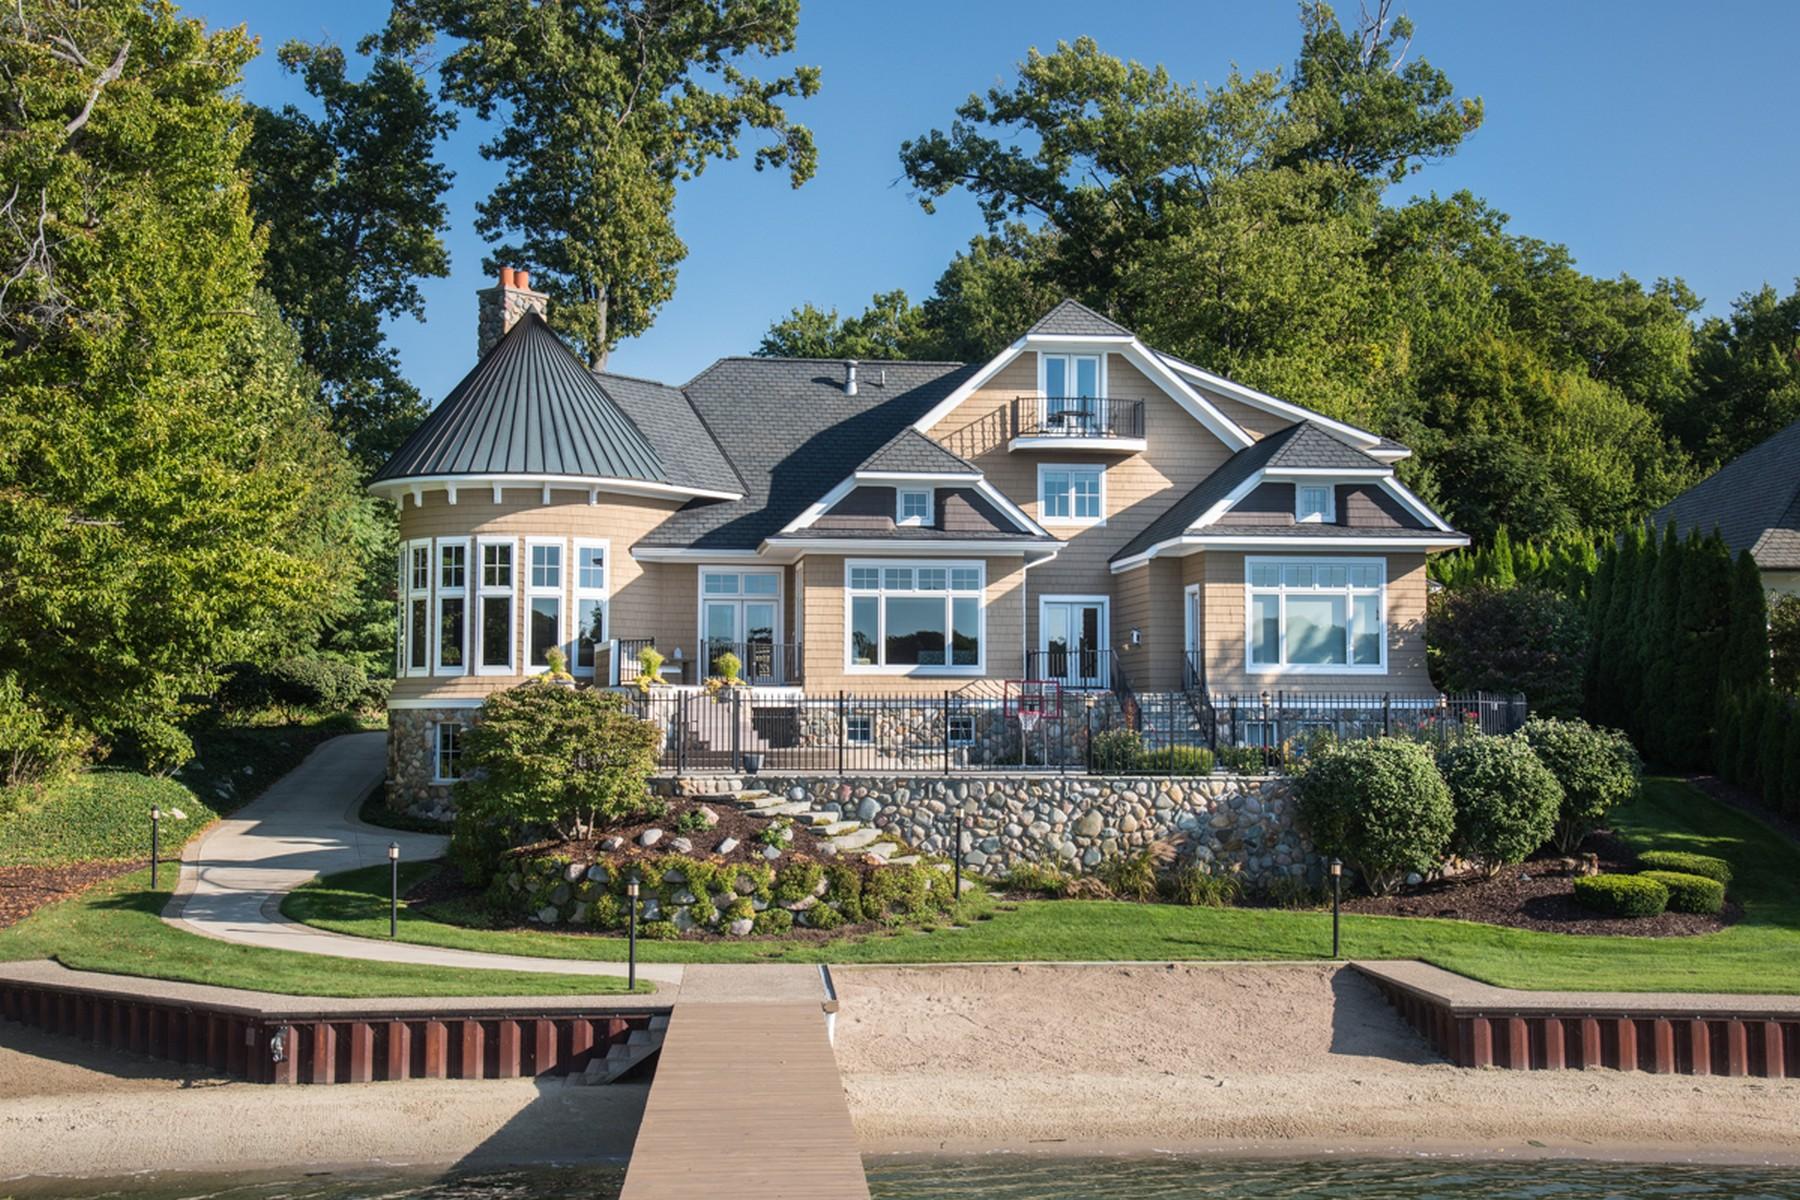 獨棟家庭住宅 為 出售 在 Luxurious Lakefront Home On Lake Macatawa 833 Barkentine Drive Holland, 密歇根州, 49424 美國